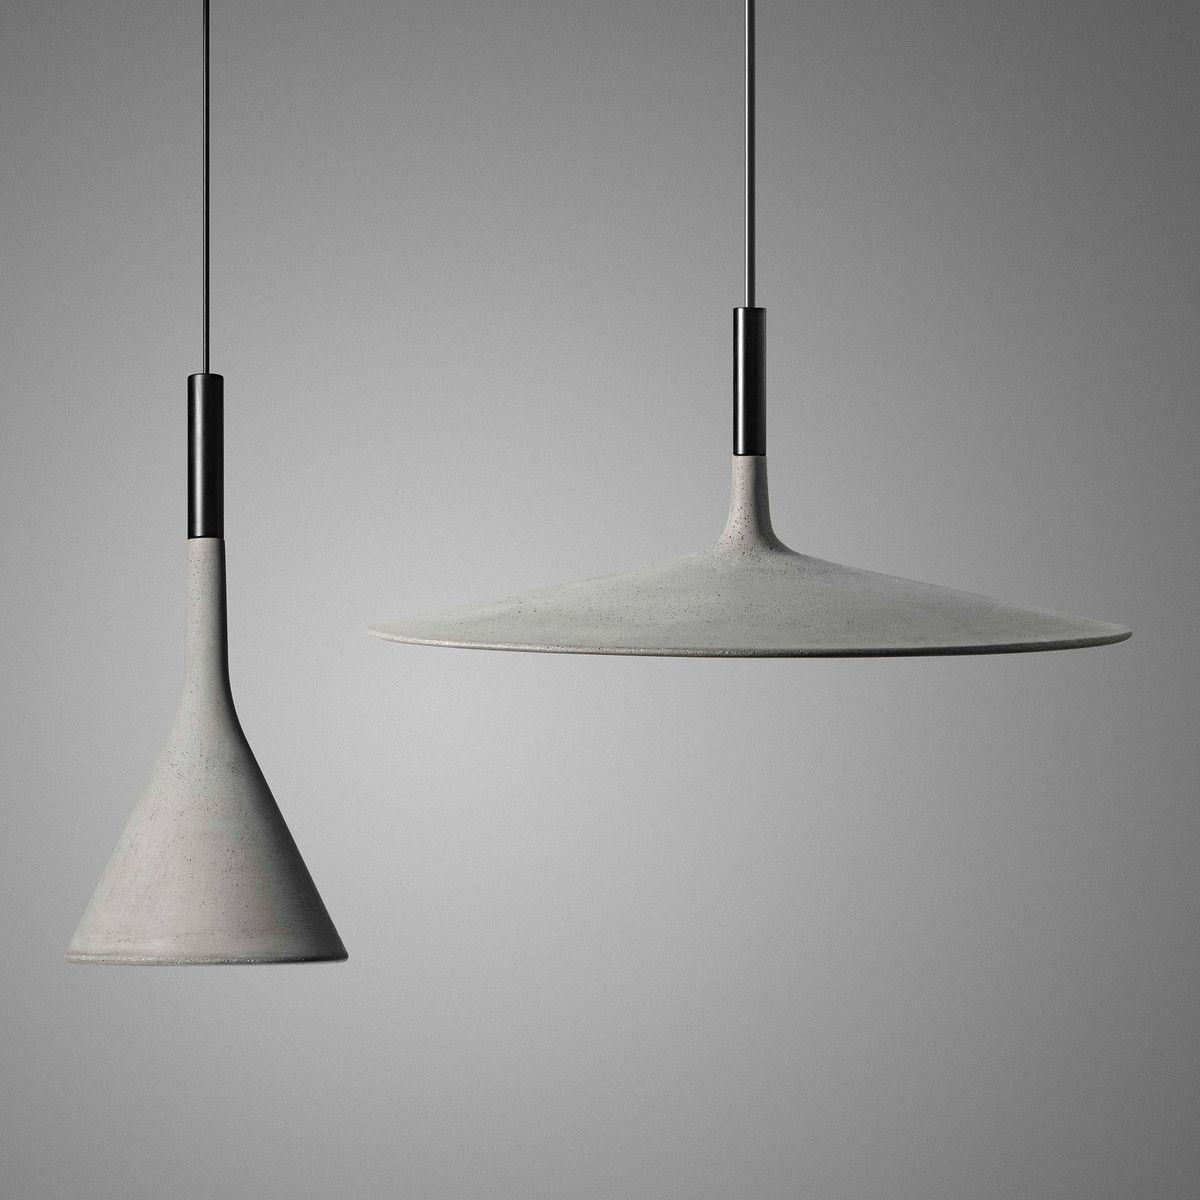 Foscarini   Aplomb Large, Marrone. The Pendant Lamp Aplomb By Foscarini  Combines Concrete ...